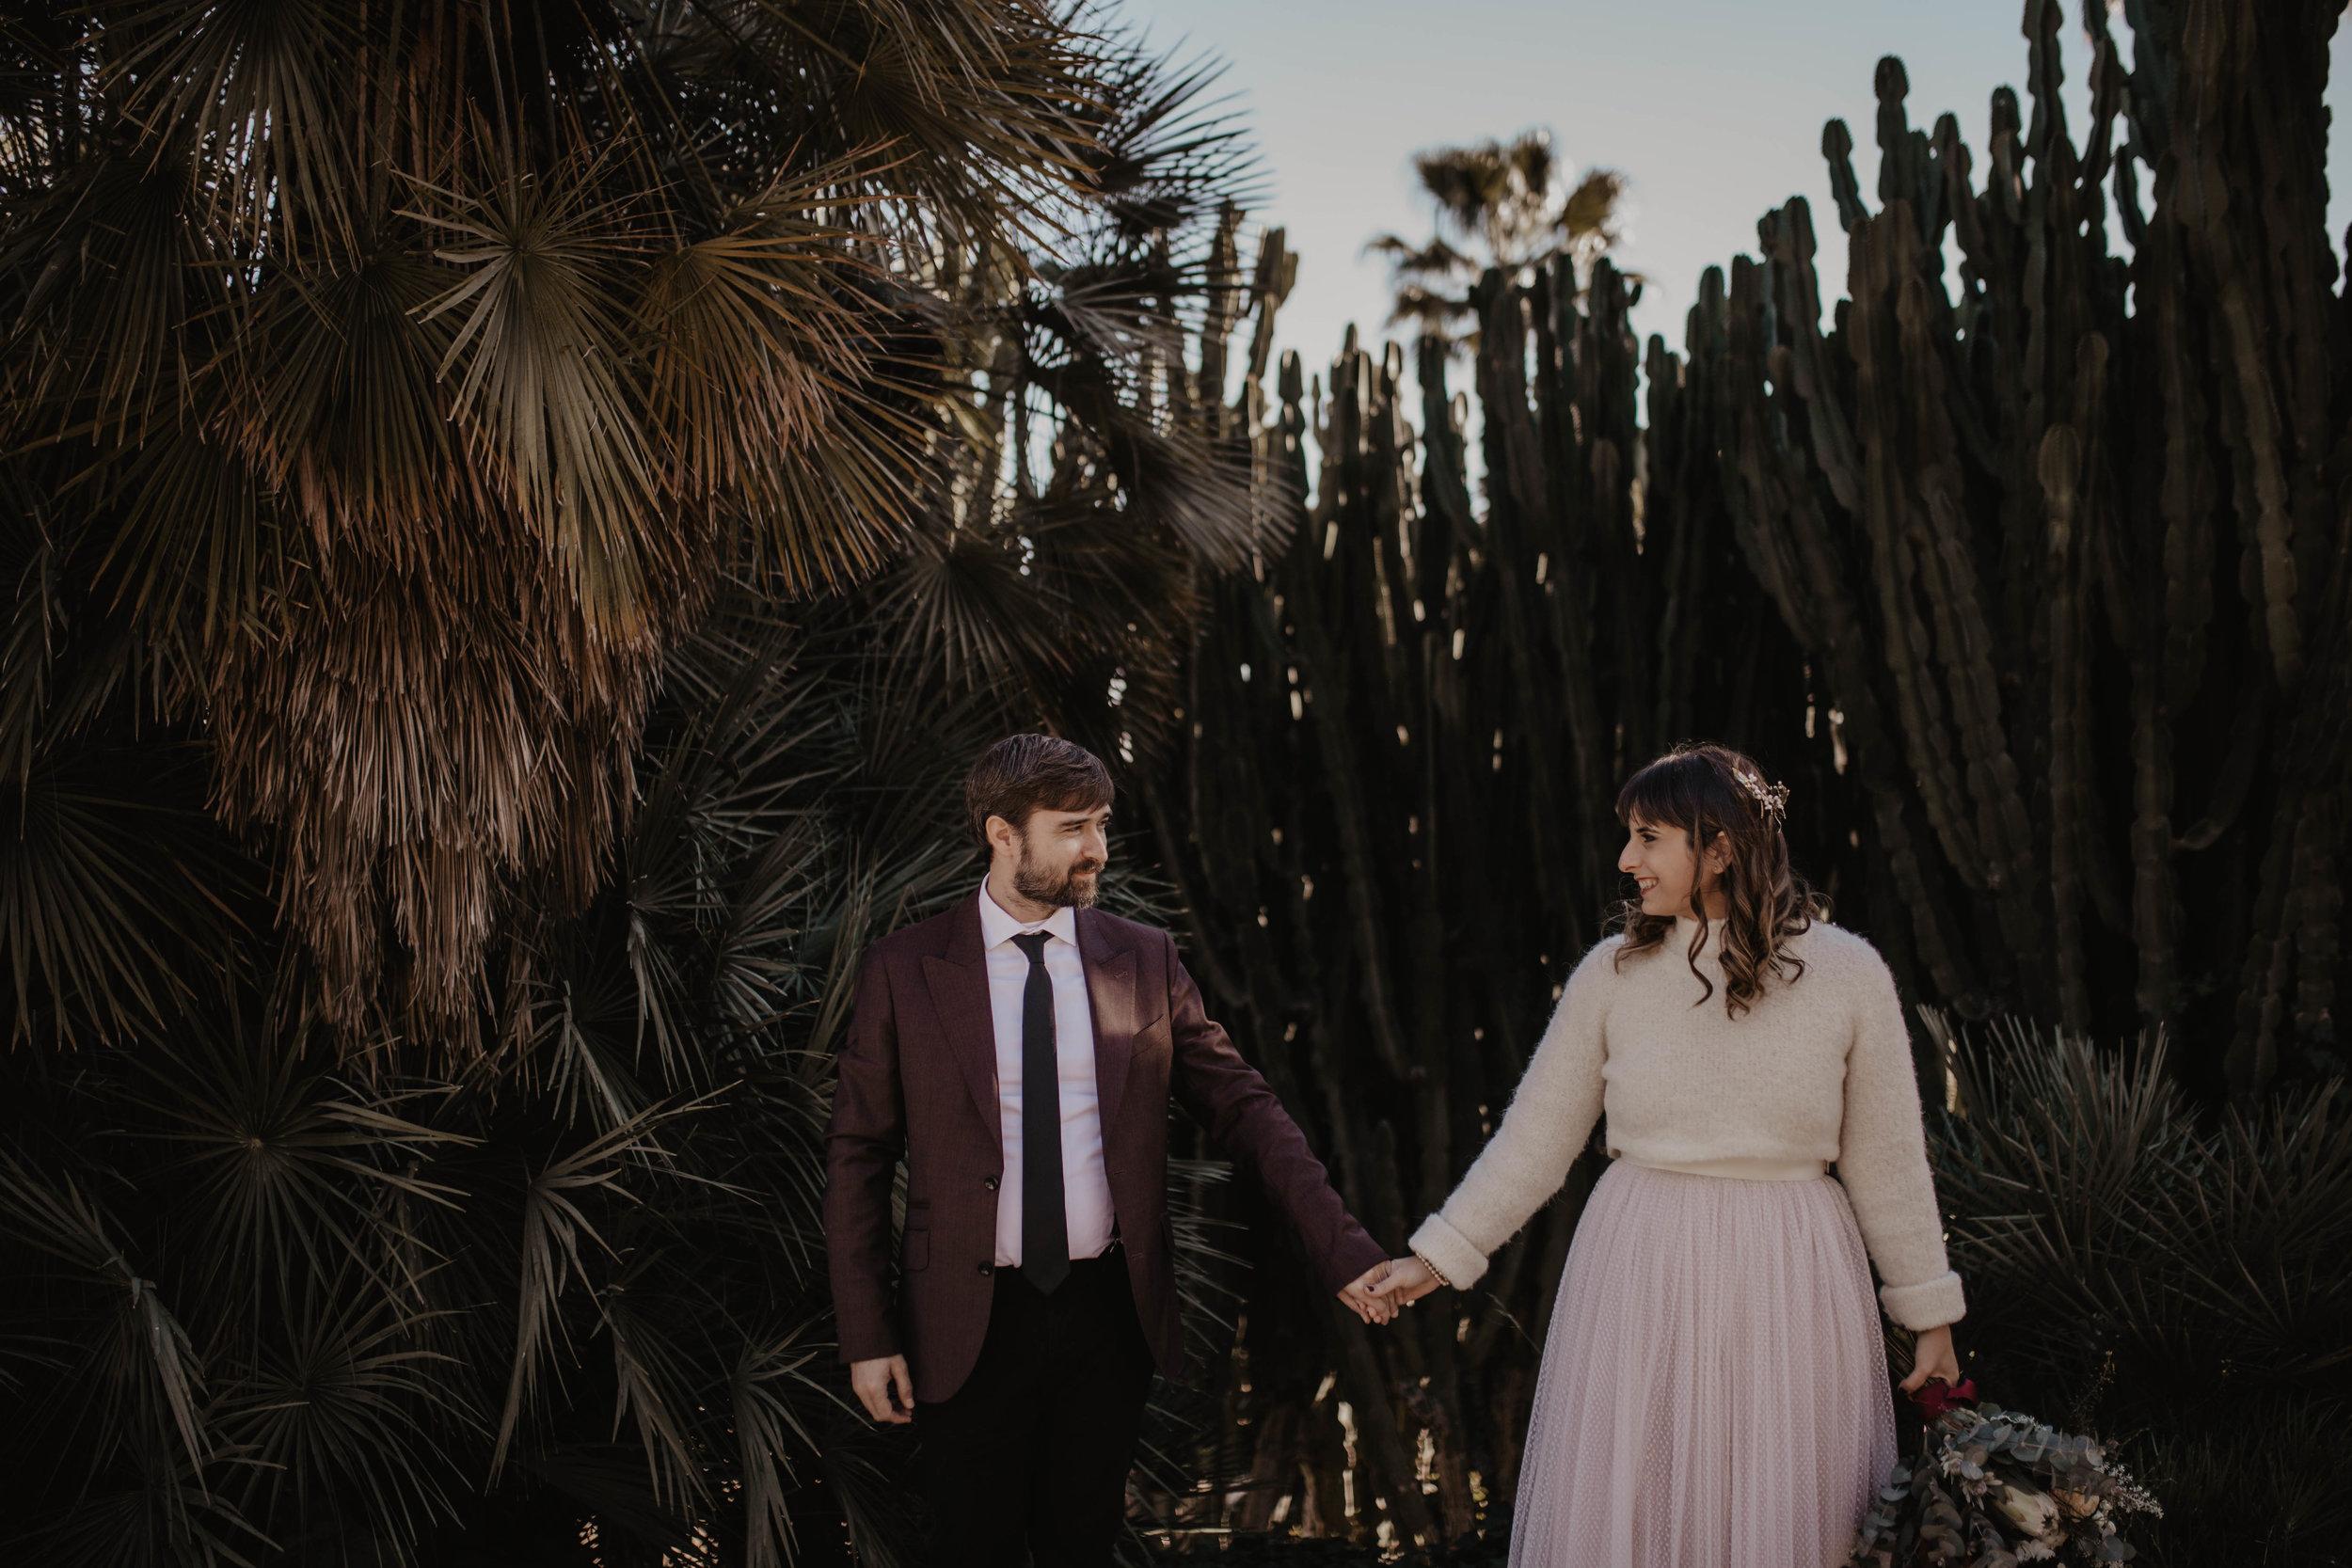 thenortherngirlphotography-photography-weddingphotography-couple-bodasconestilo-bodasenbarcelona-martadavid-280.jpg